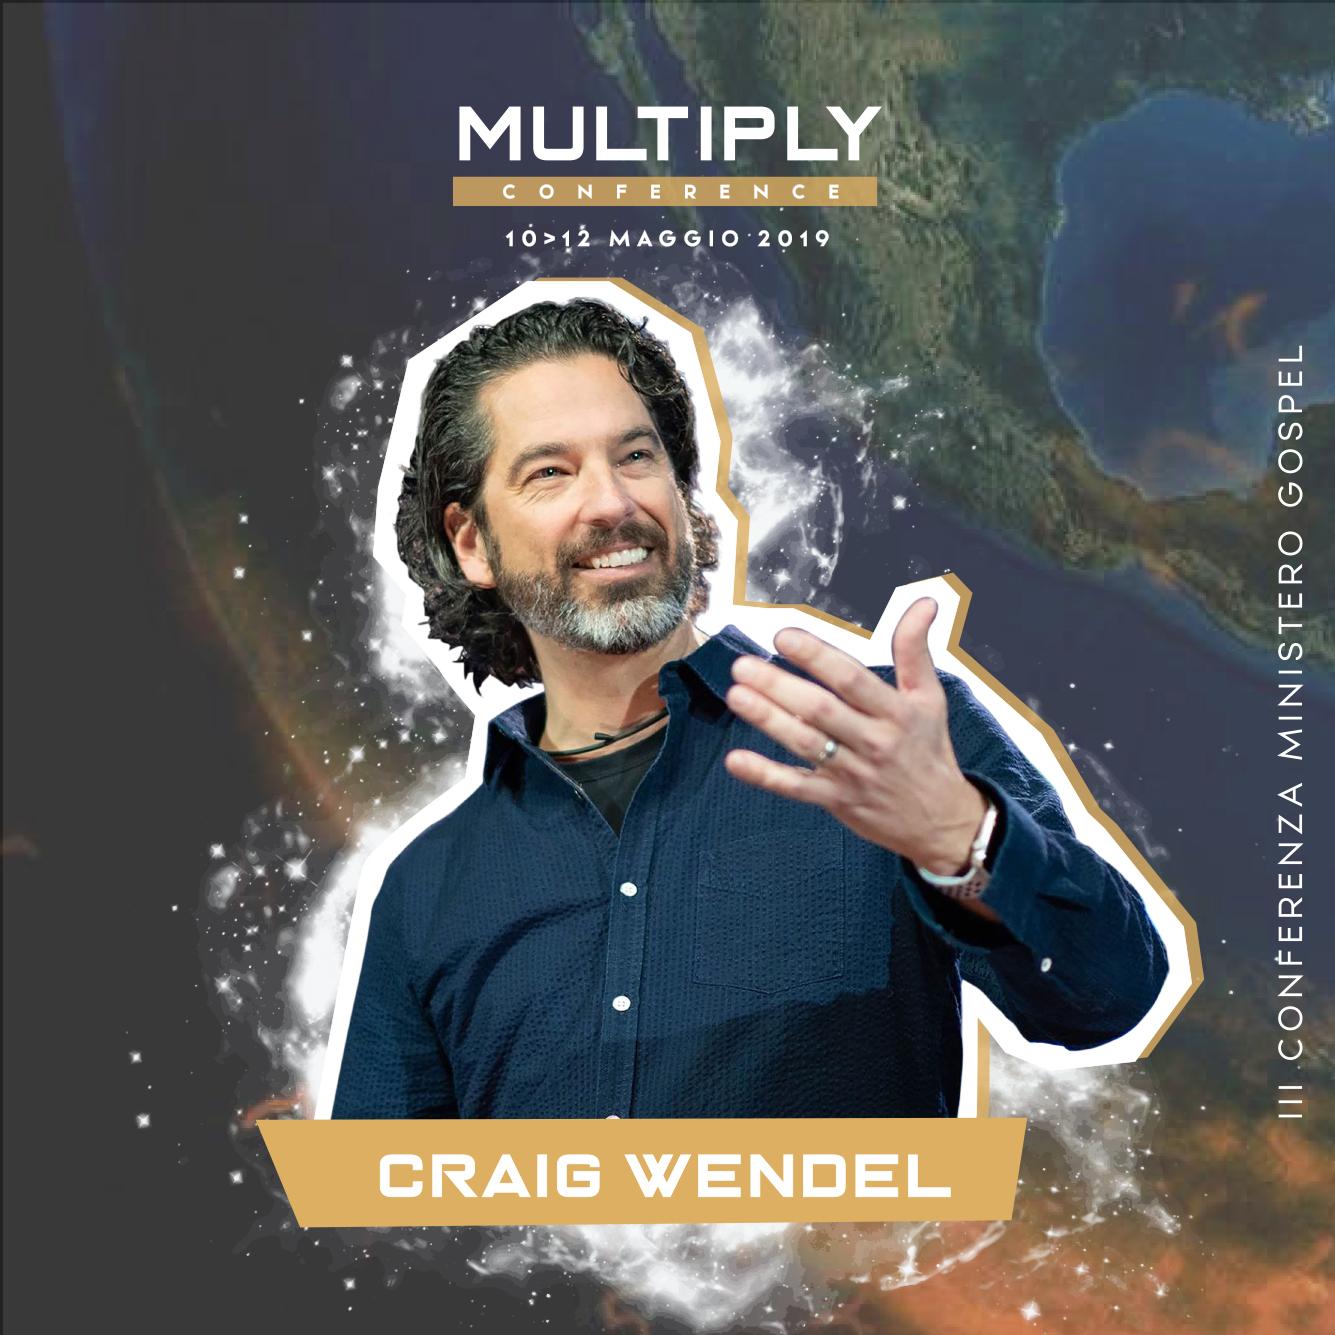 Past. Craig Wendel